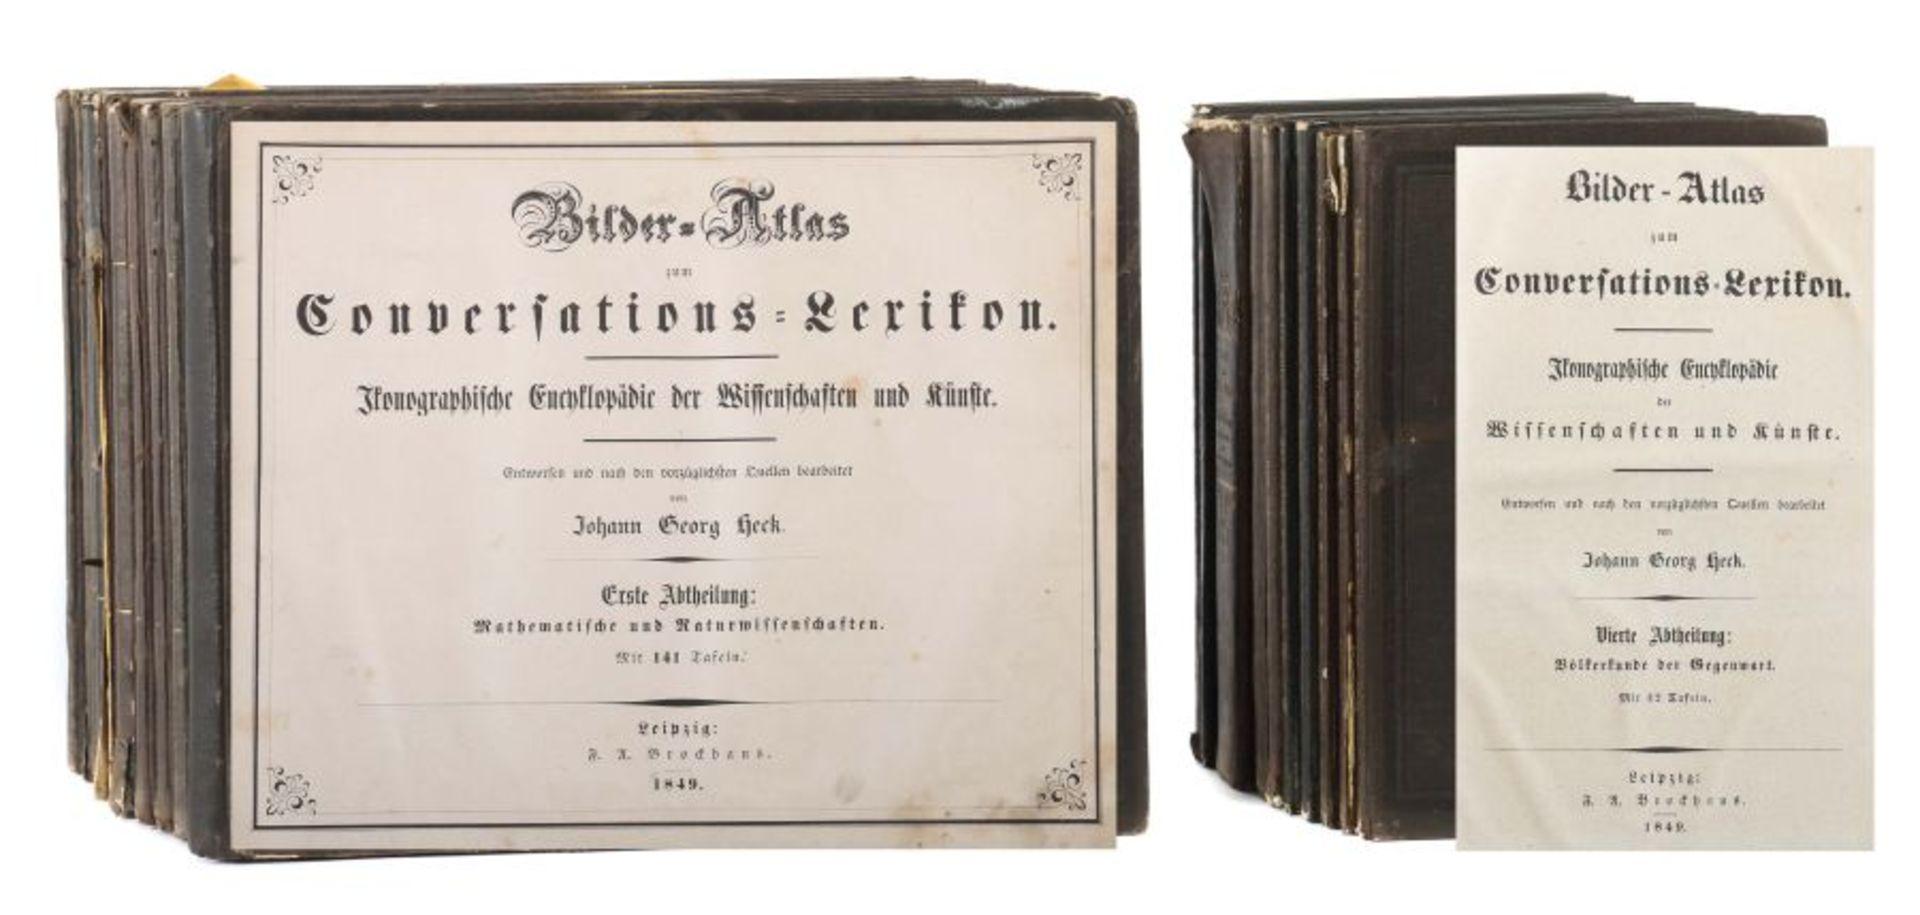 Heck, Johann Georg (bearb.) Bilder-Atlas zum Conversations-Lexikon - Ikonographische Encyklopädie